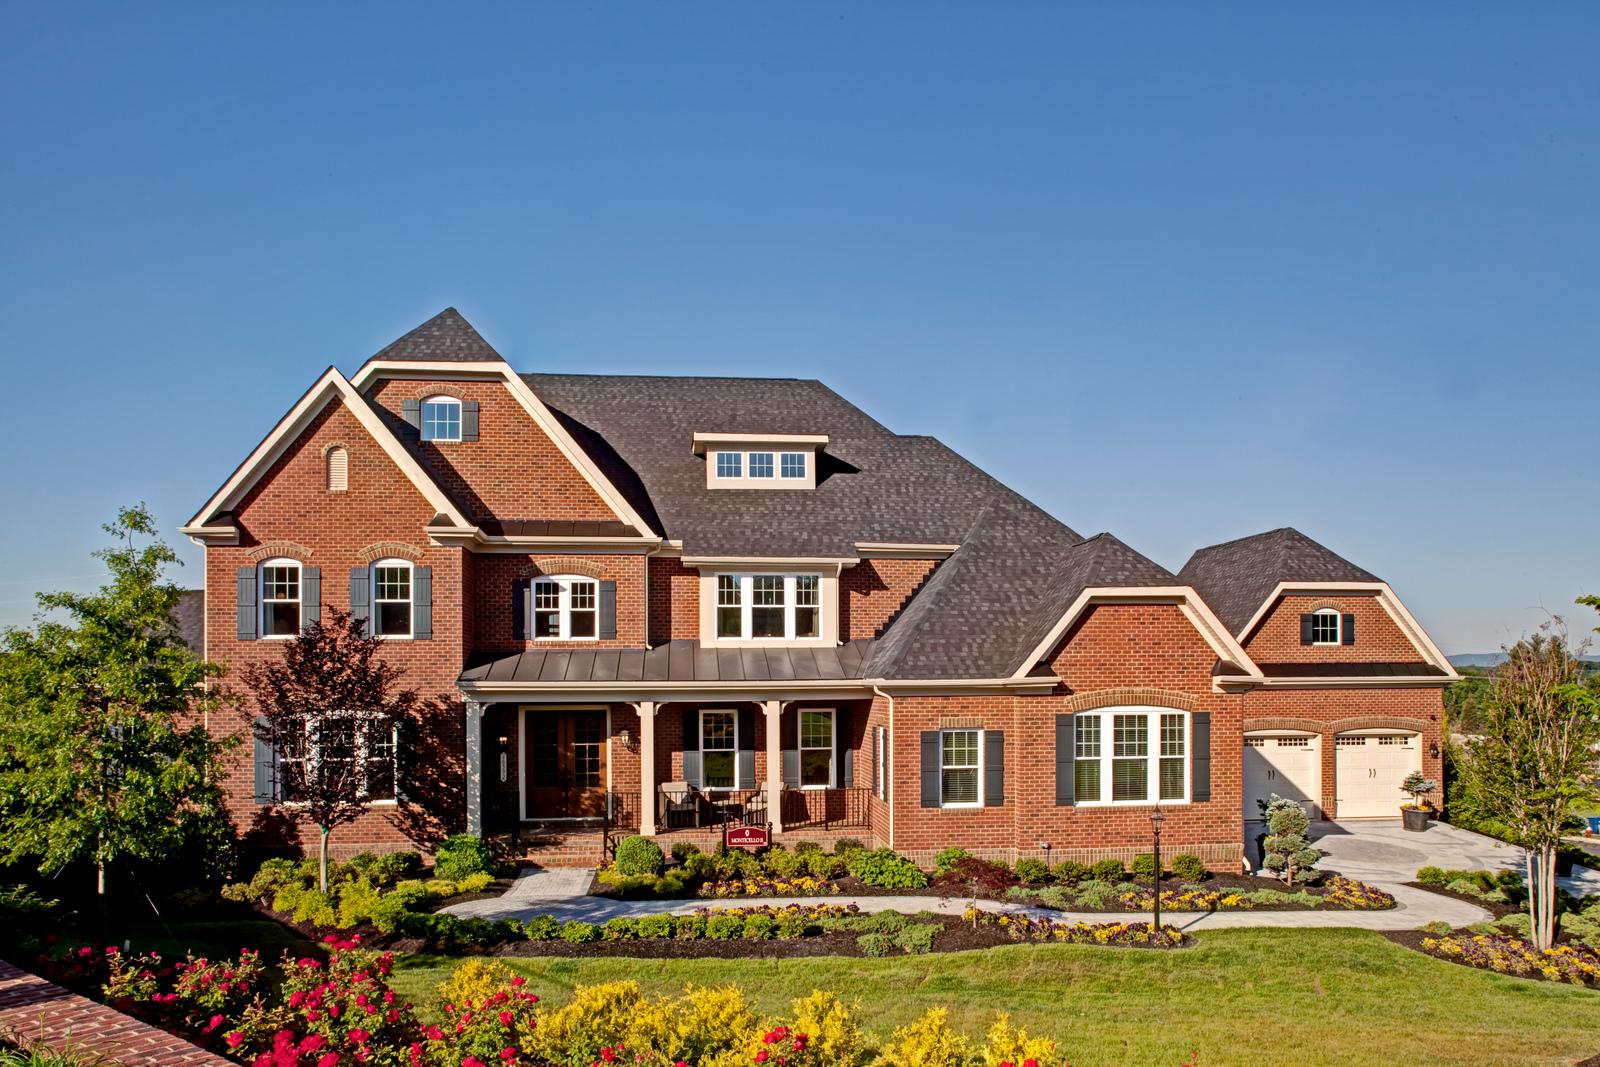 Nv homes model home investment